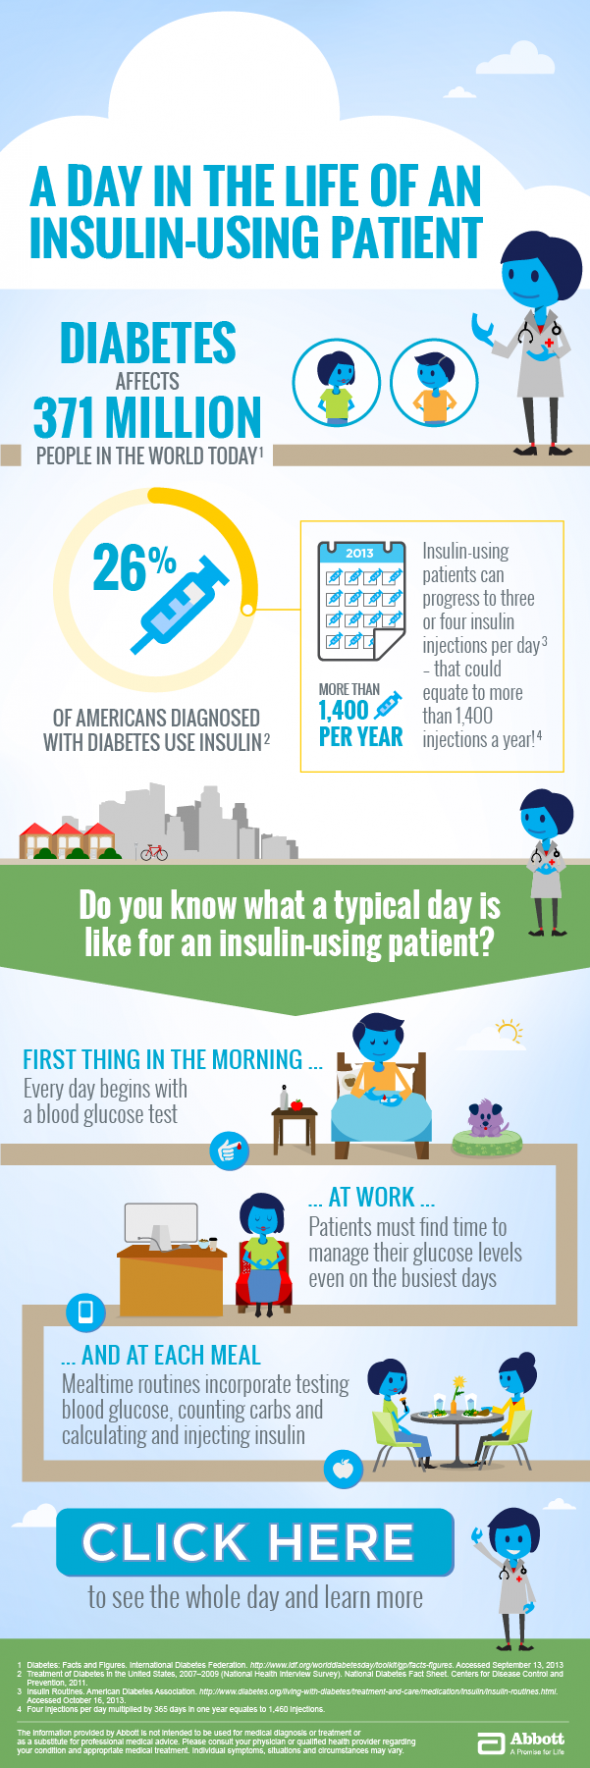 insulin-using-patient-590x1768